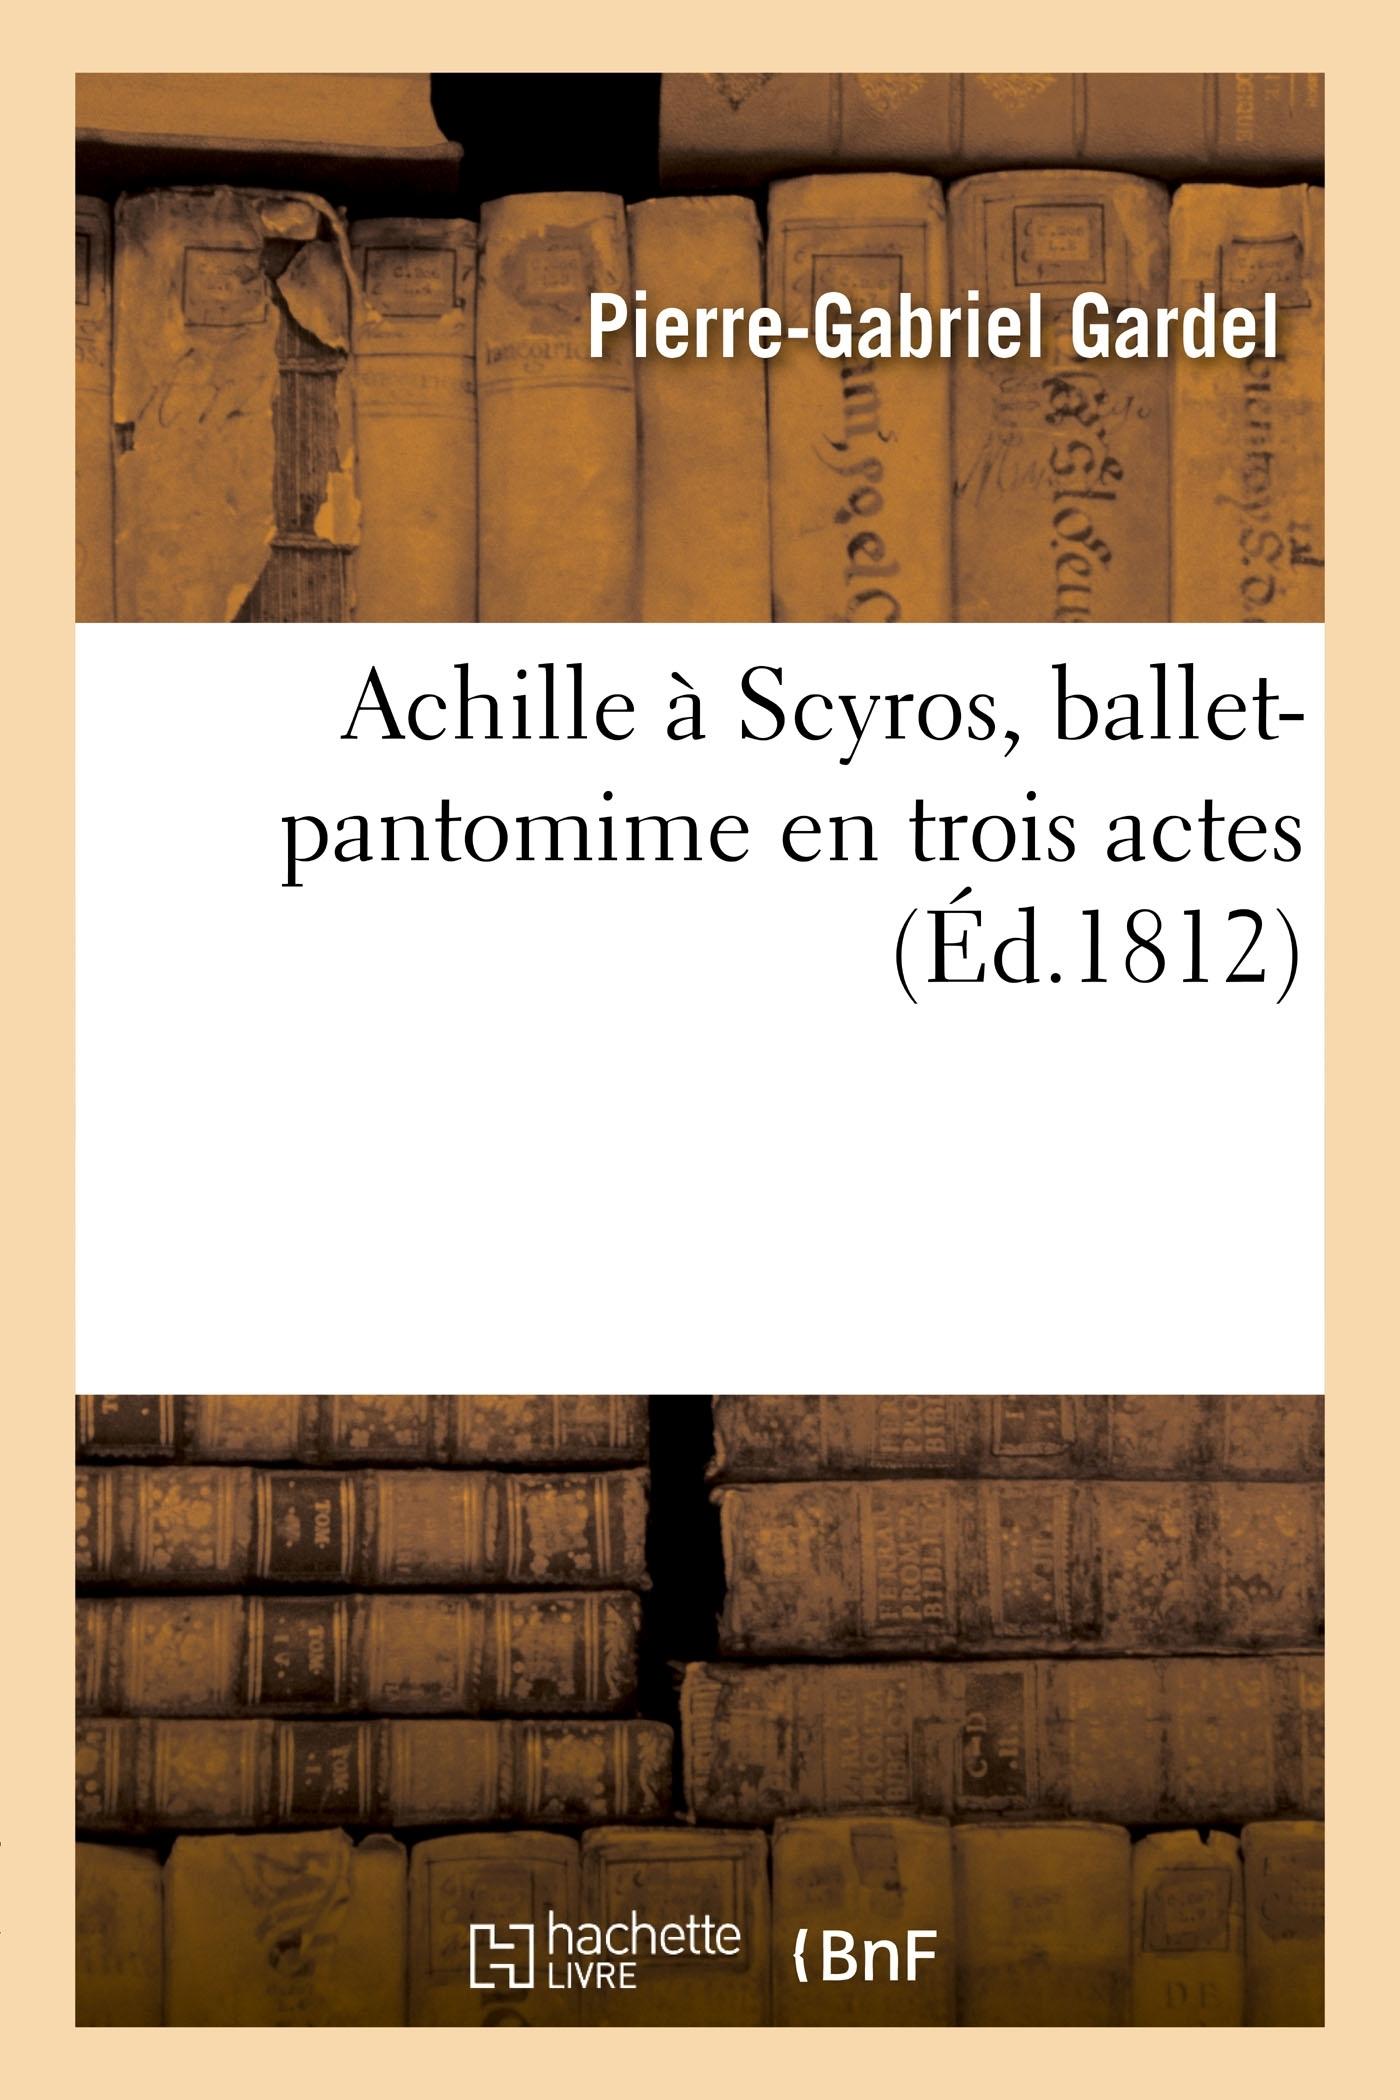 ACHILLE A SCYROS, BALLET-PANTOMIME EN TROIS ACTES